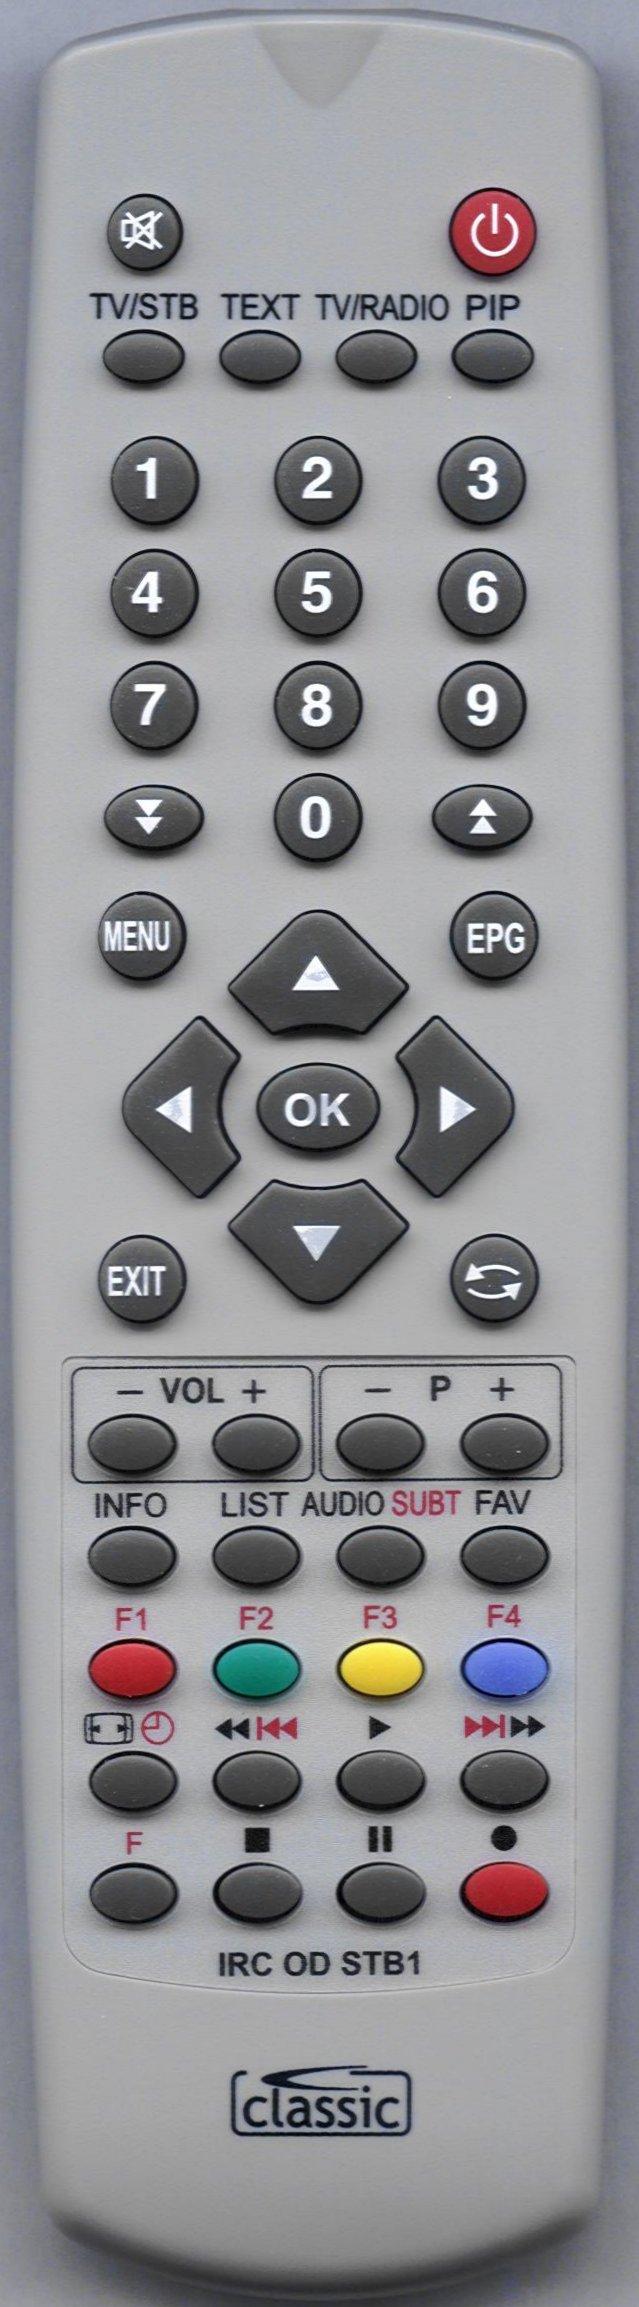 THOMSON THS812 Remote Control